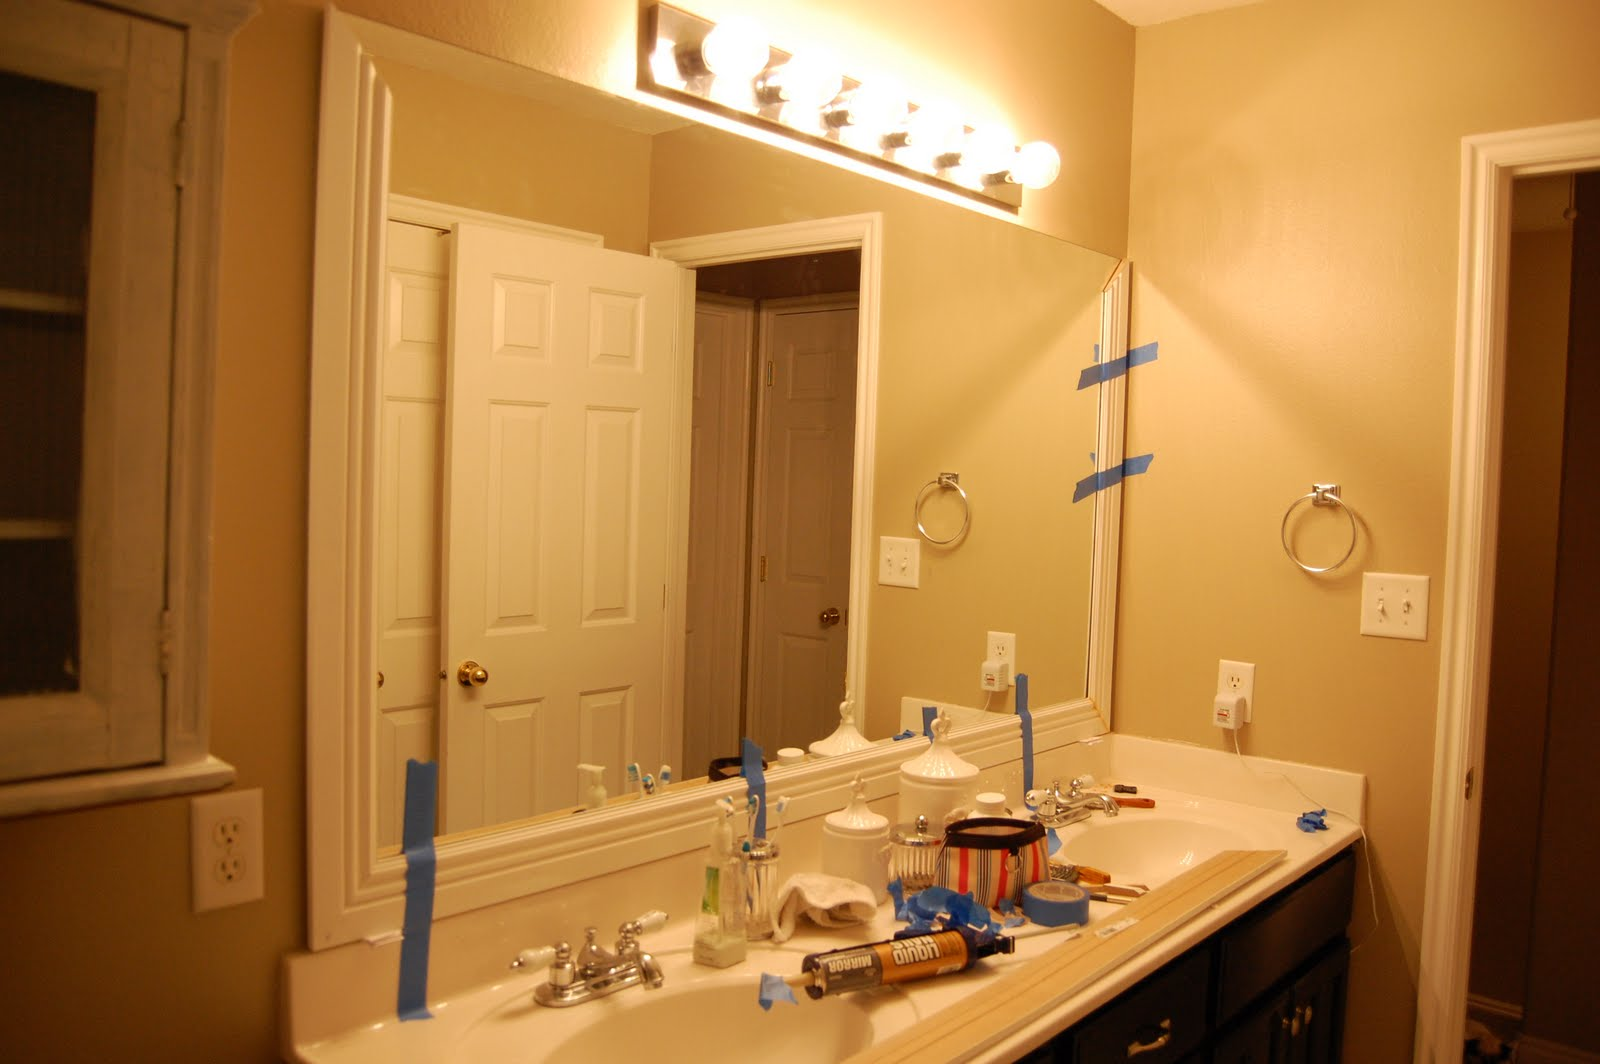 Bathroom mirror trim